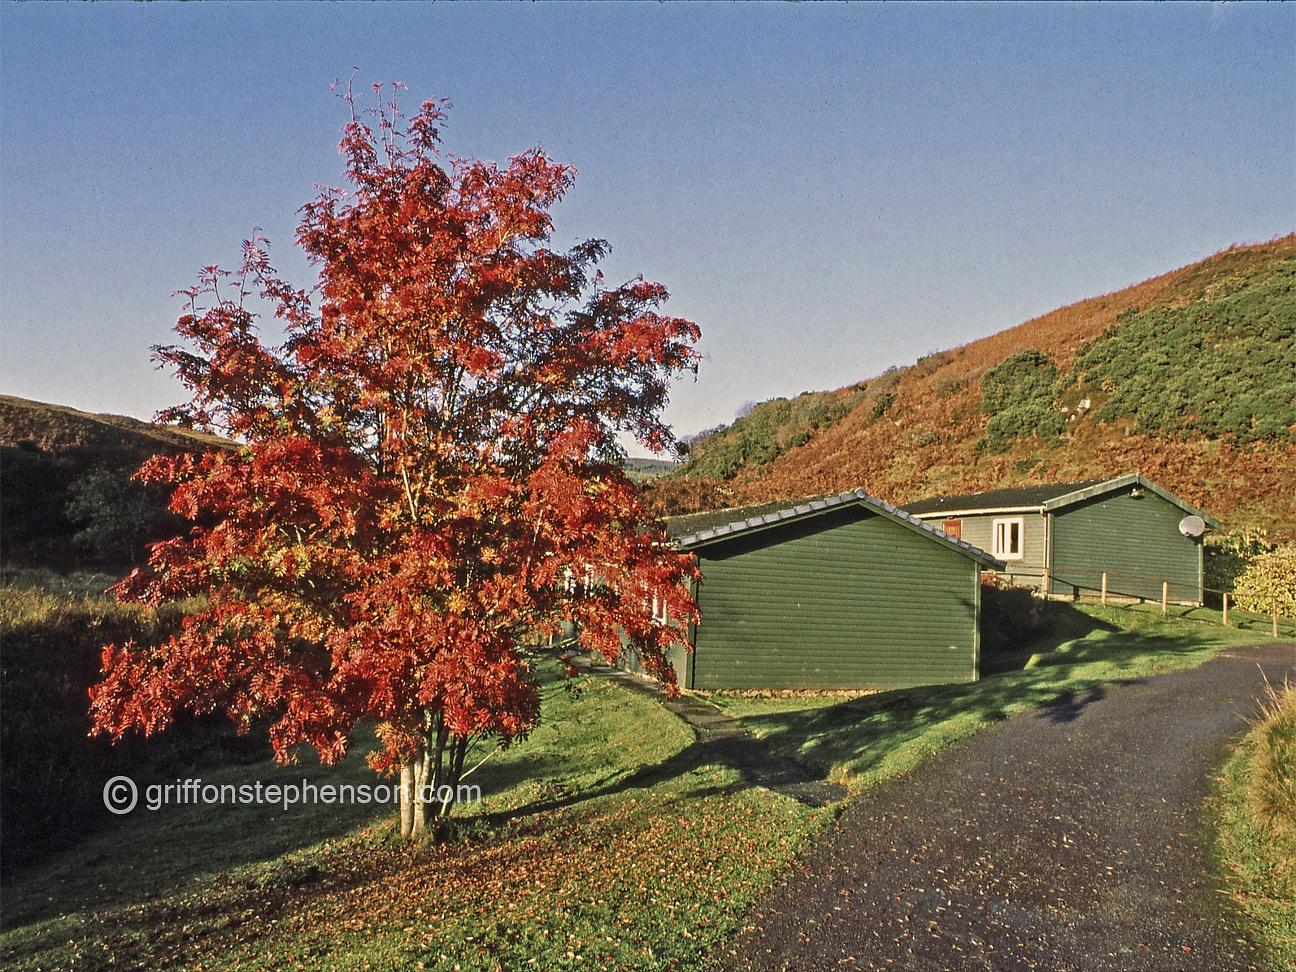 The Red Rowan Tree by Thomas Dyer@griffonstephenson.com